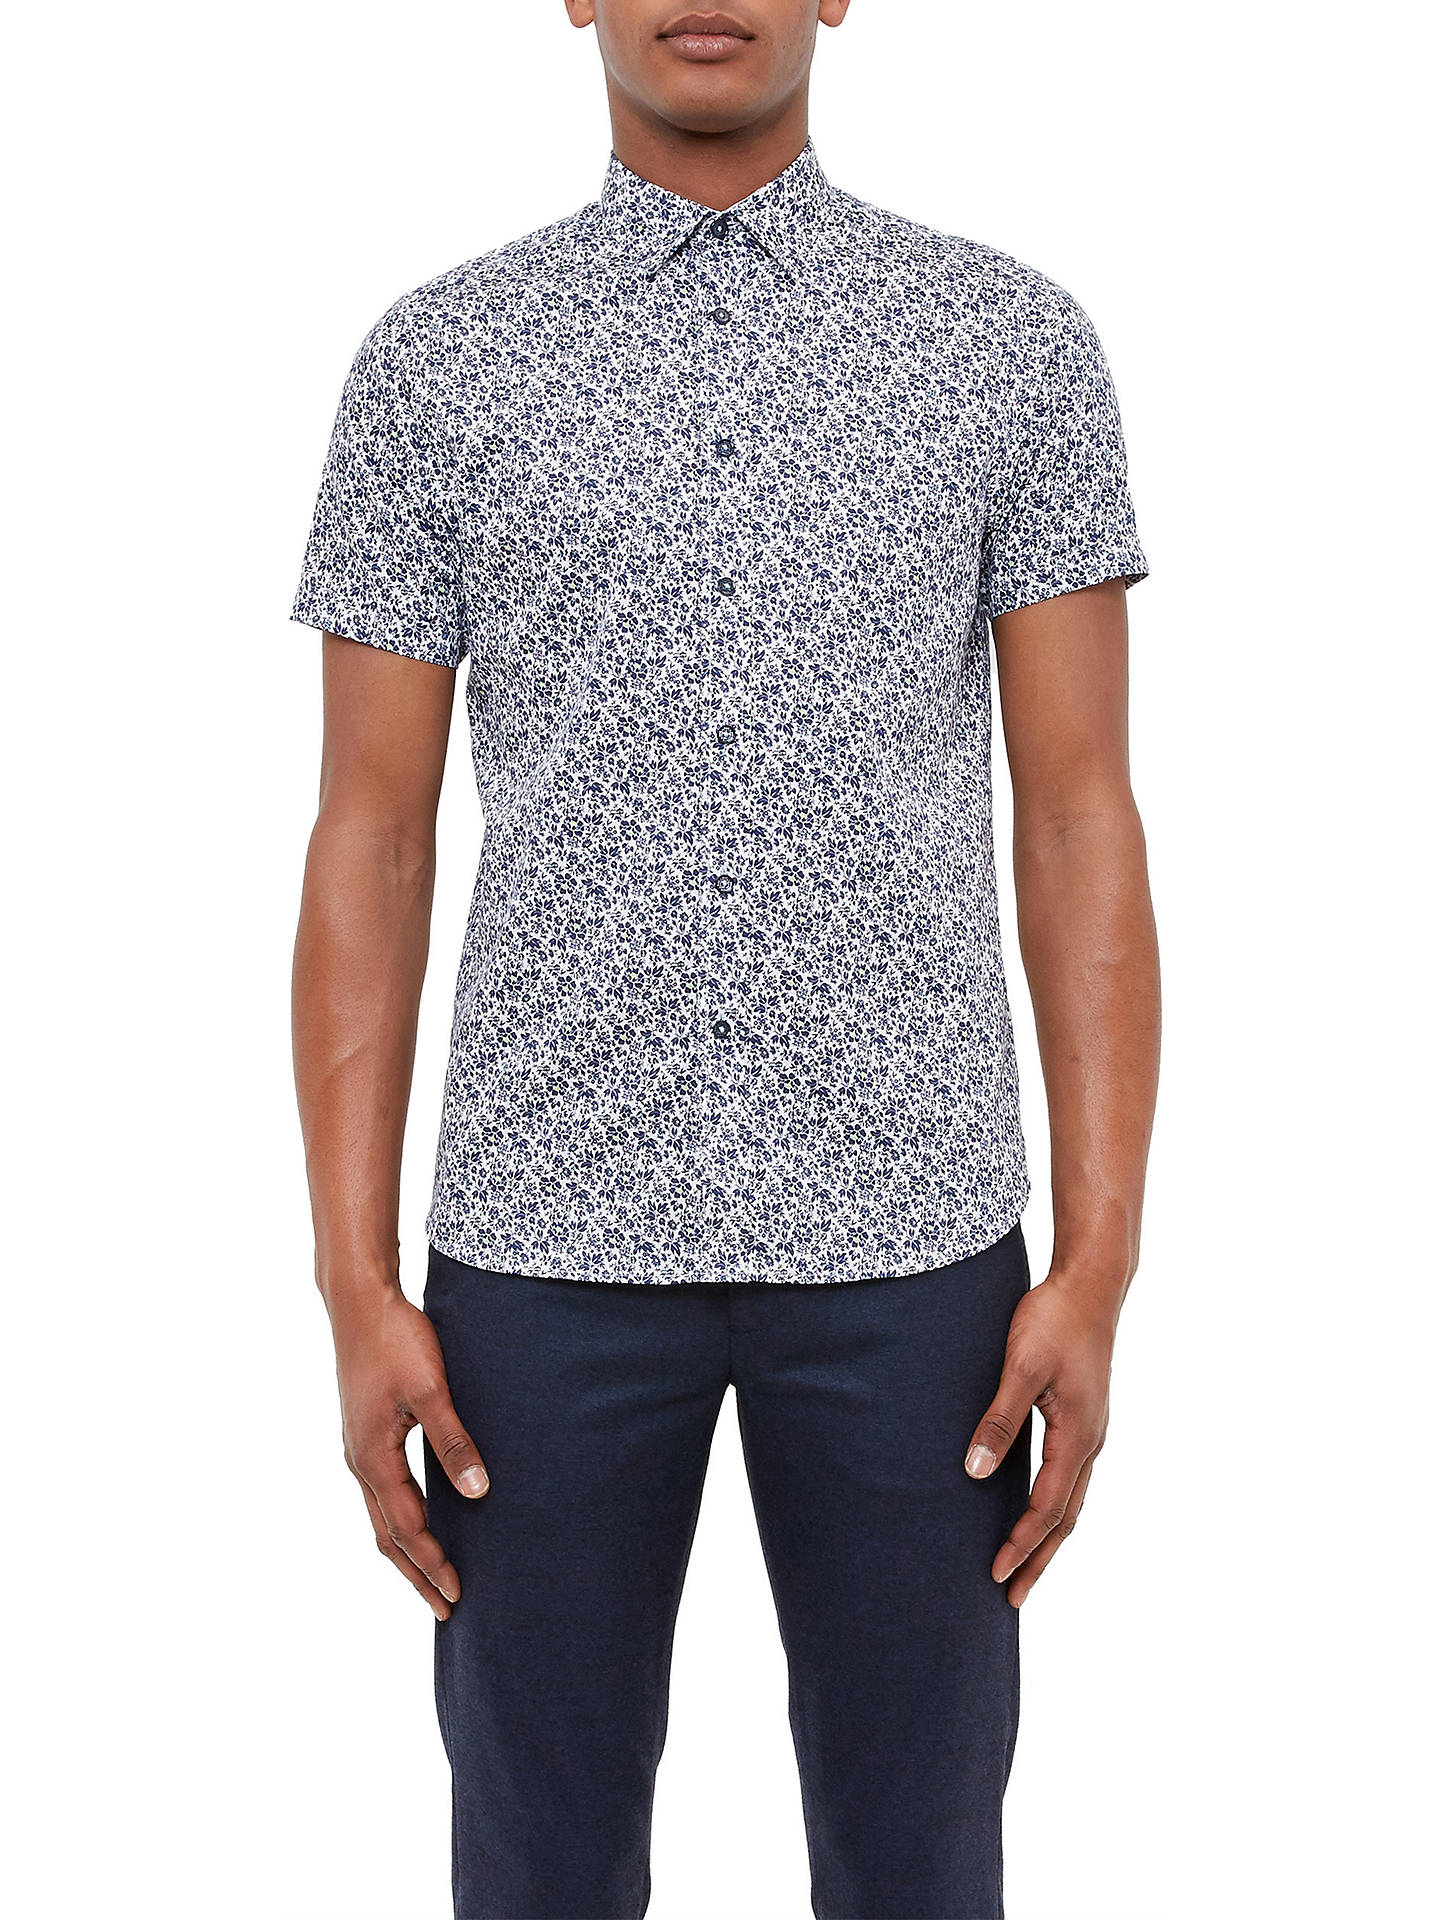 5c0672dd17c0b BuyTed Baker Alygar Floral Print Cotton Shirt